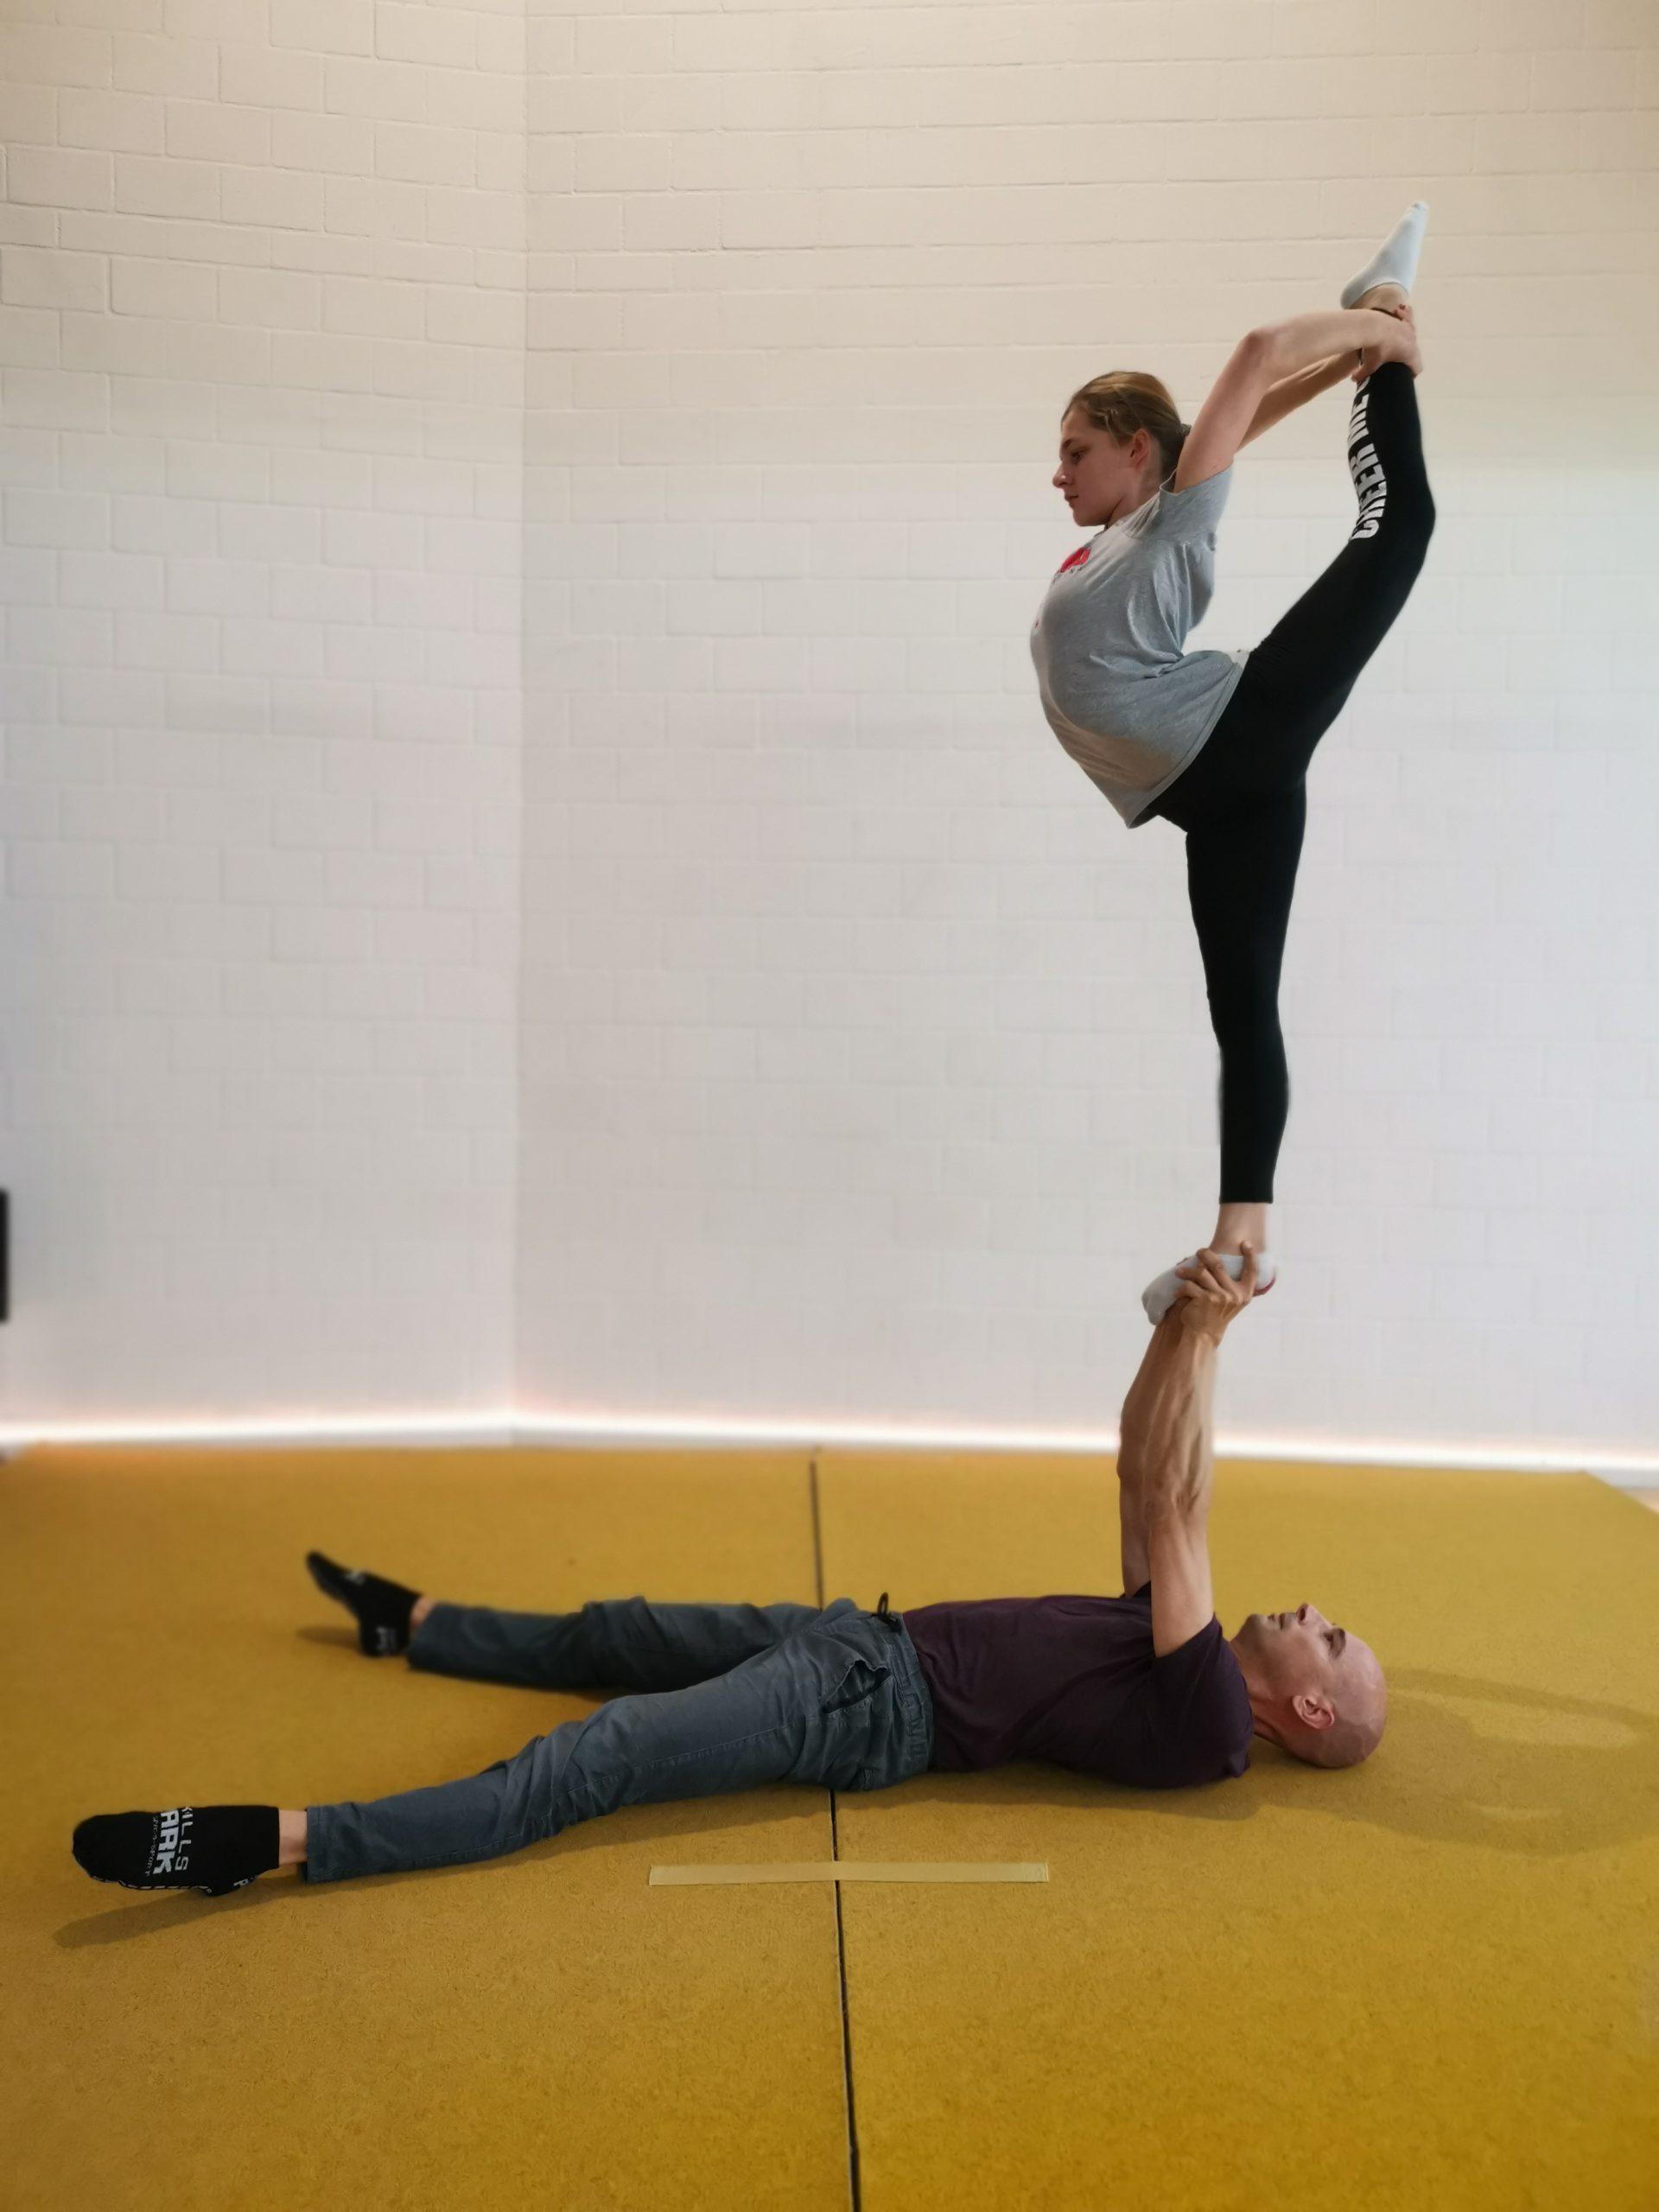 Needle, Partnerakrobatik, Kinderzirkus am Bach, Dietlikon, Zürich